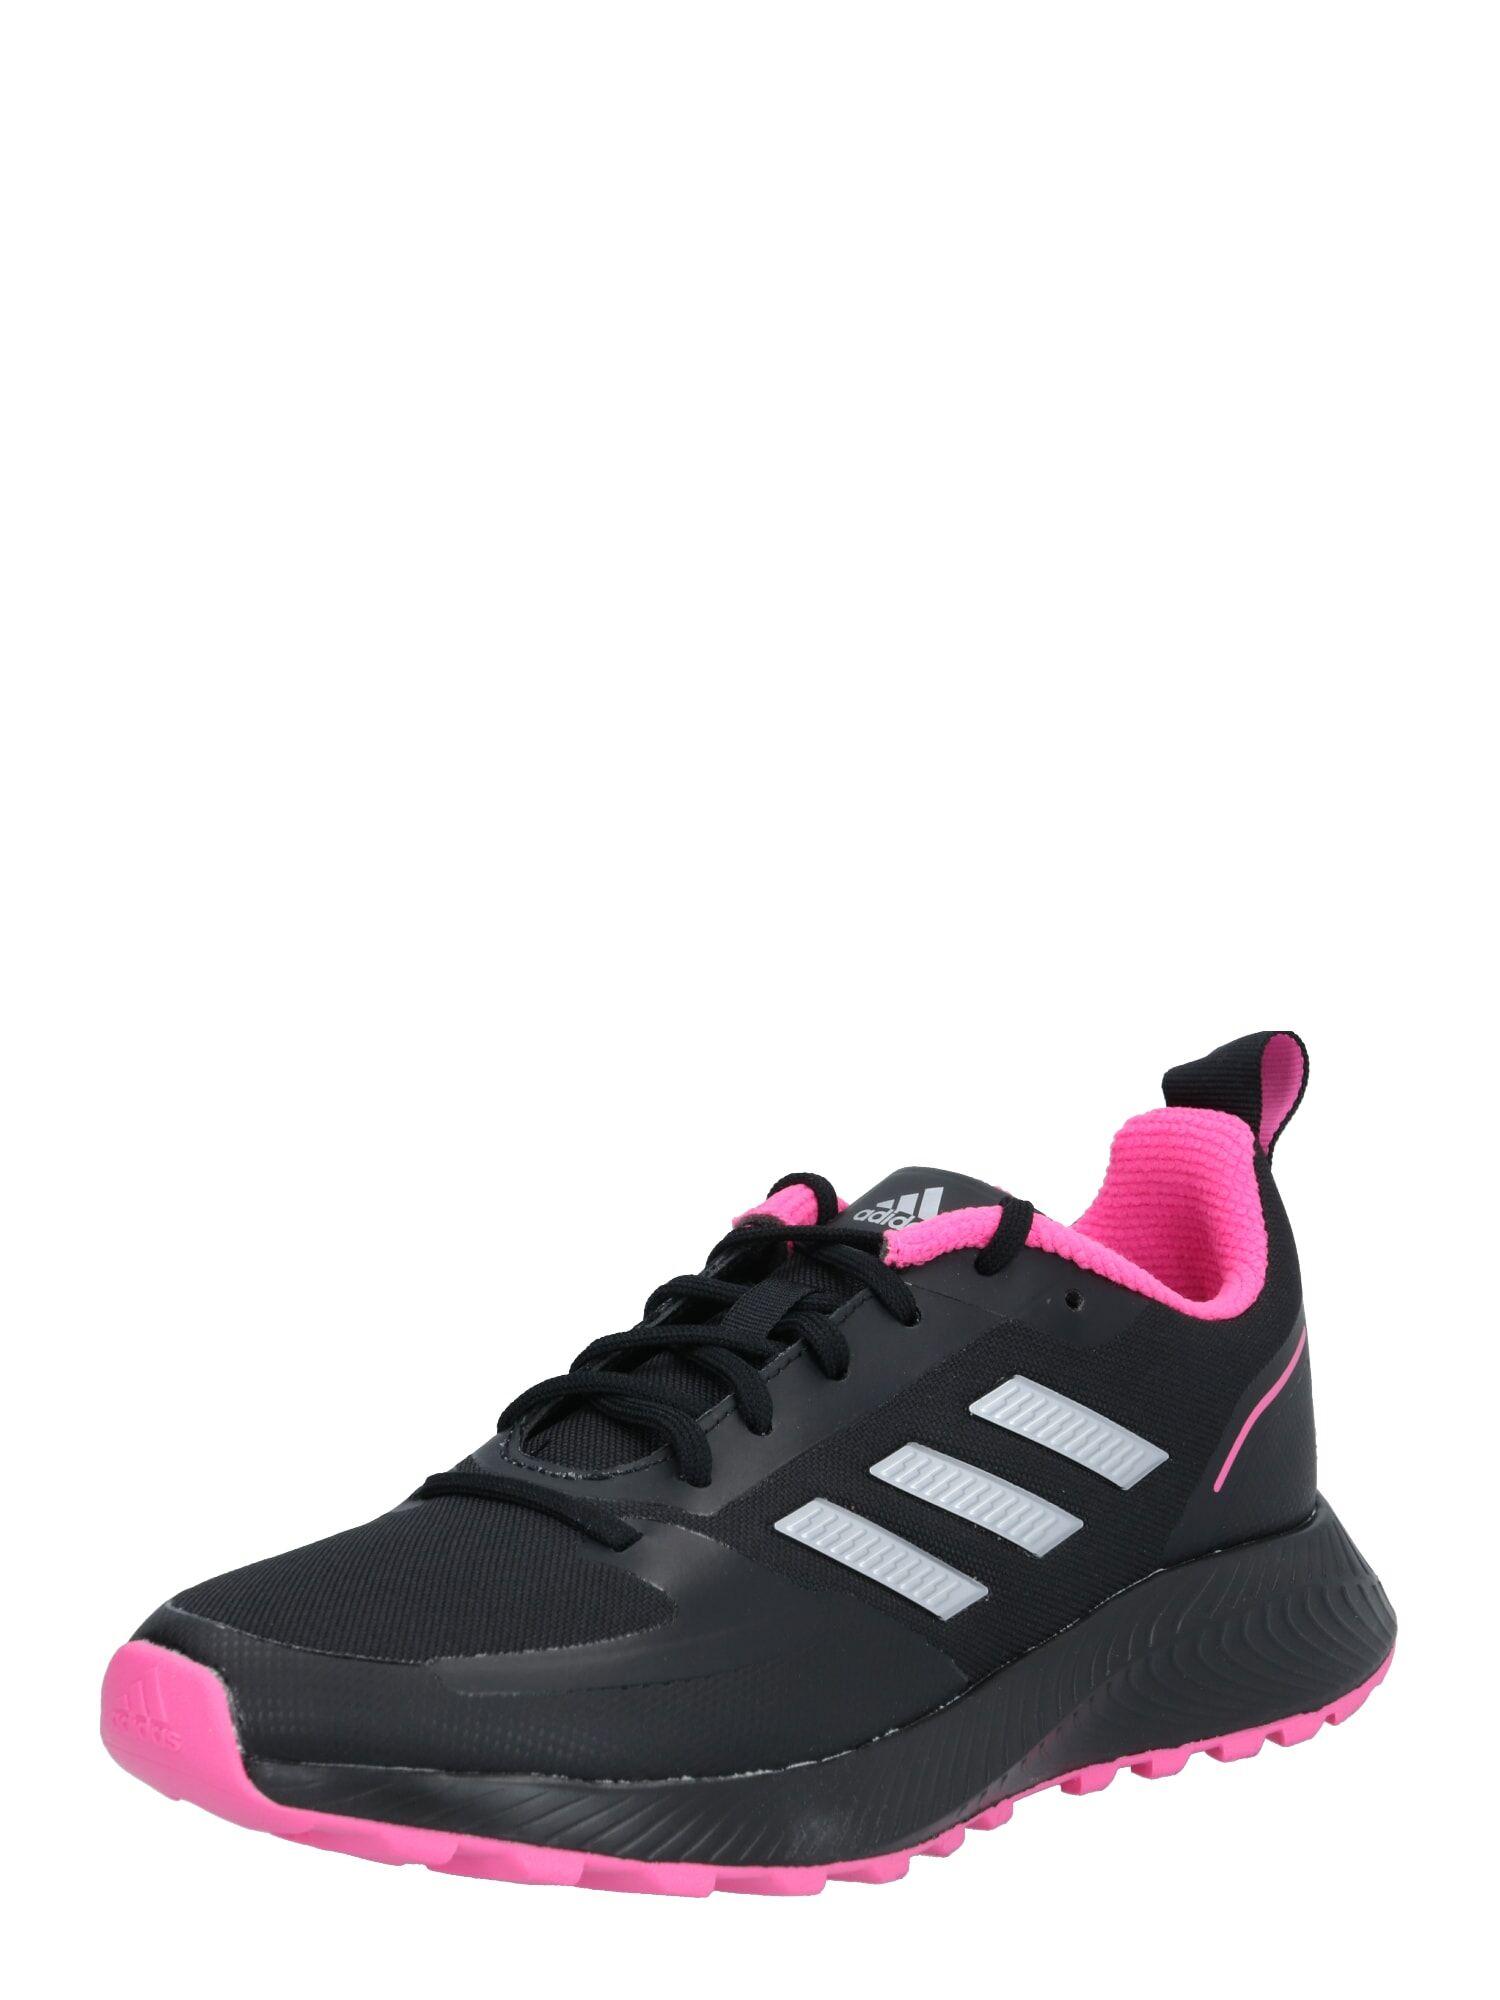 ADIDAS PERFORMANCE Chaussure de course 'Runfalcon 2.0'  - Noir - Taille: 7 - female